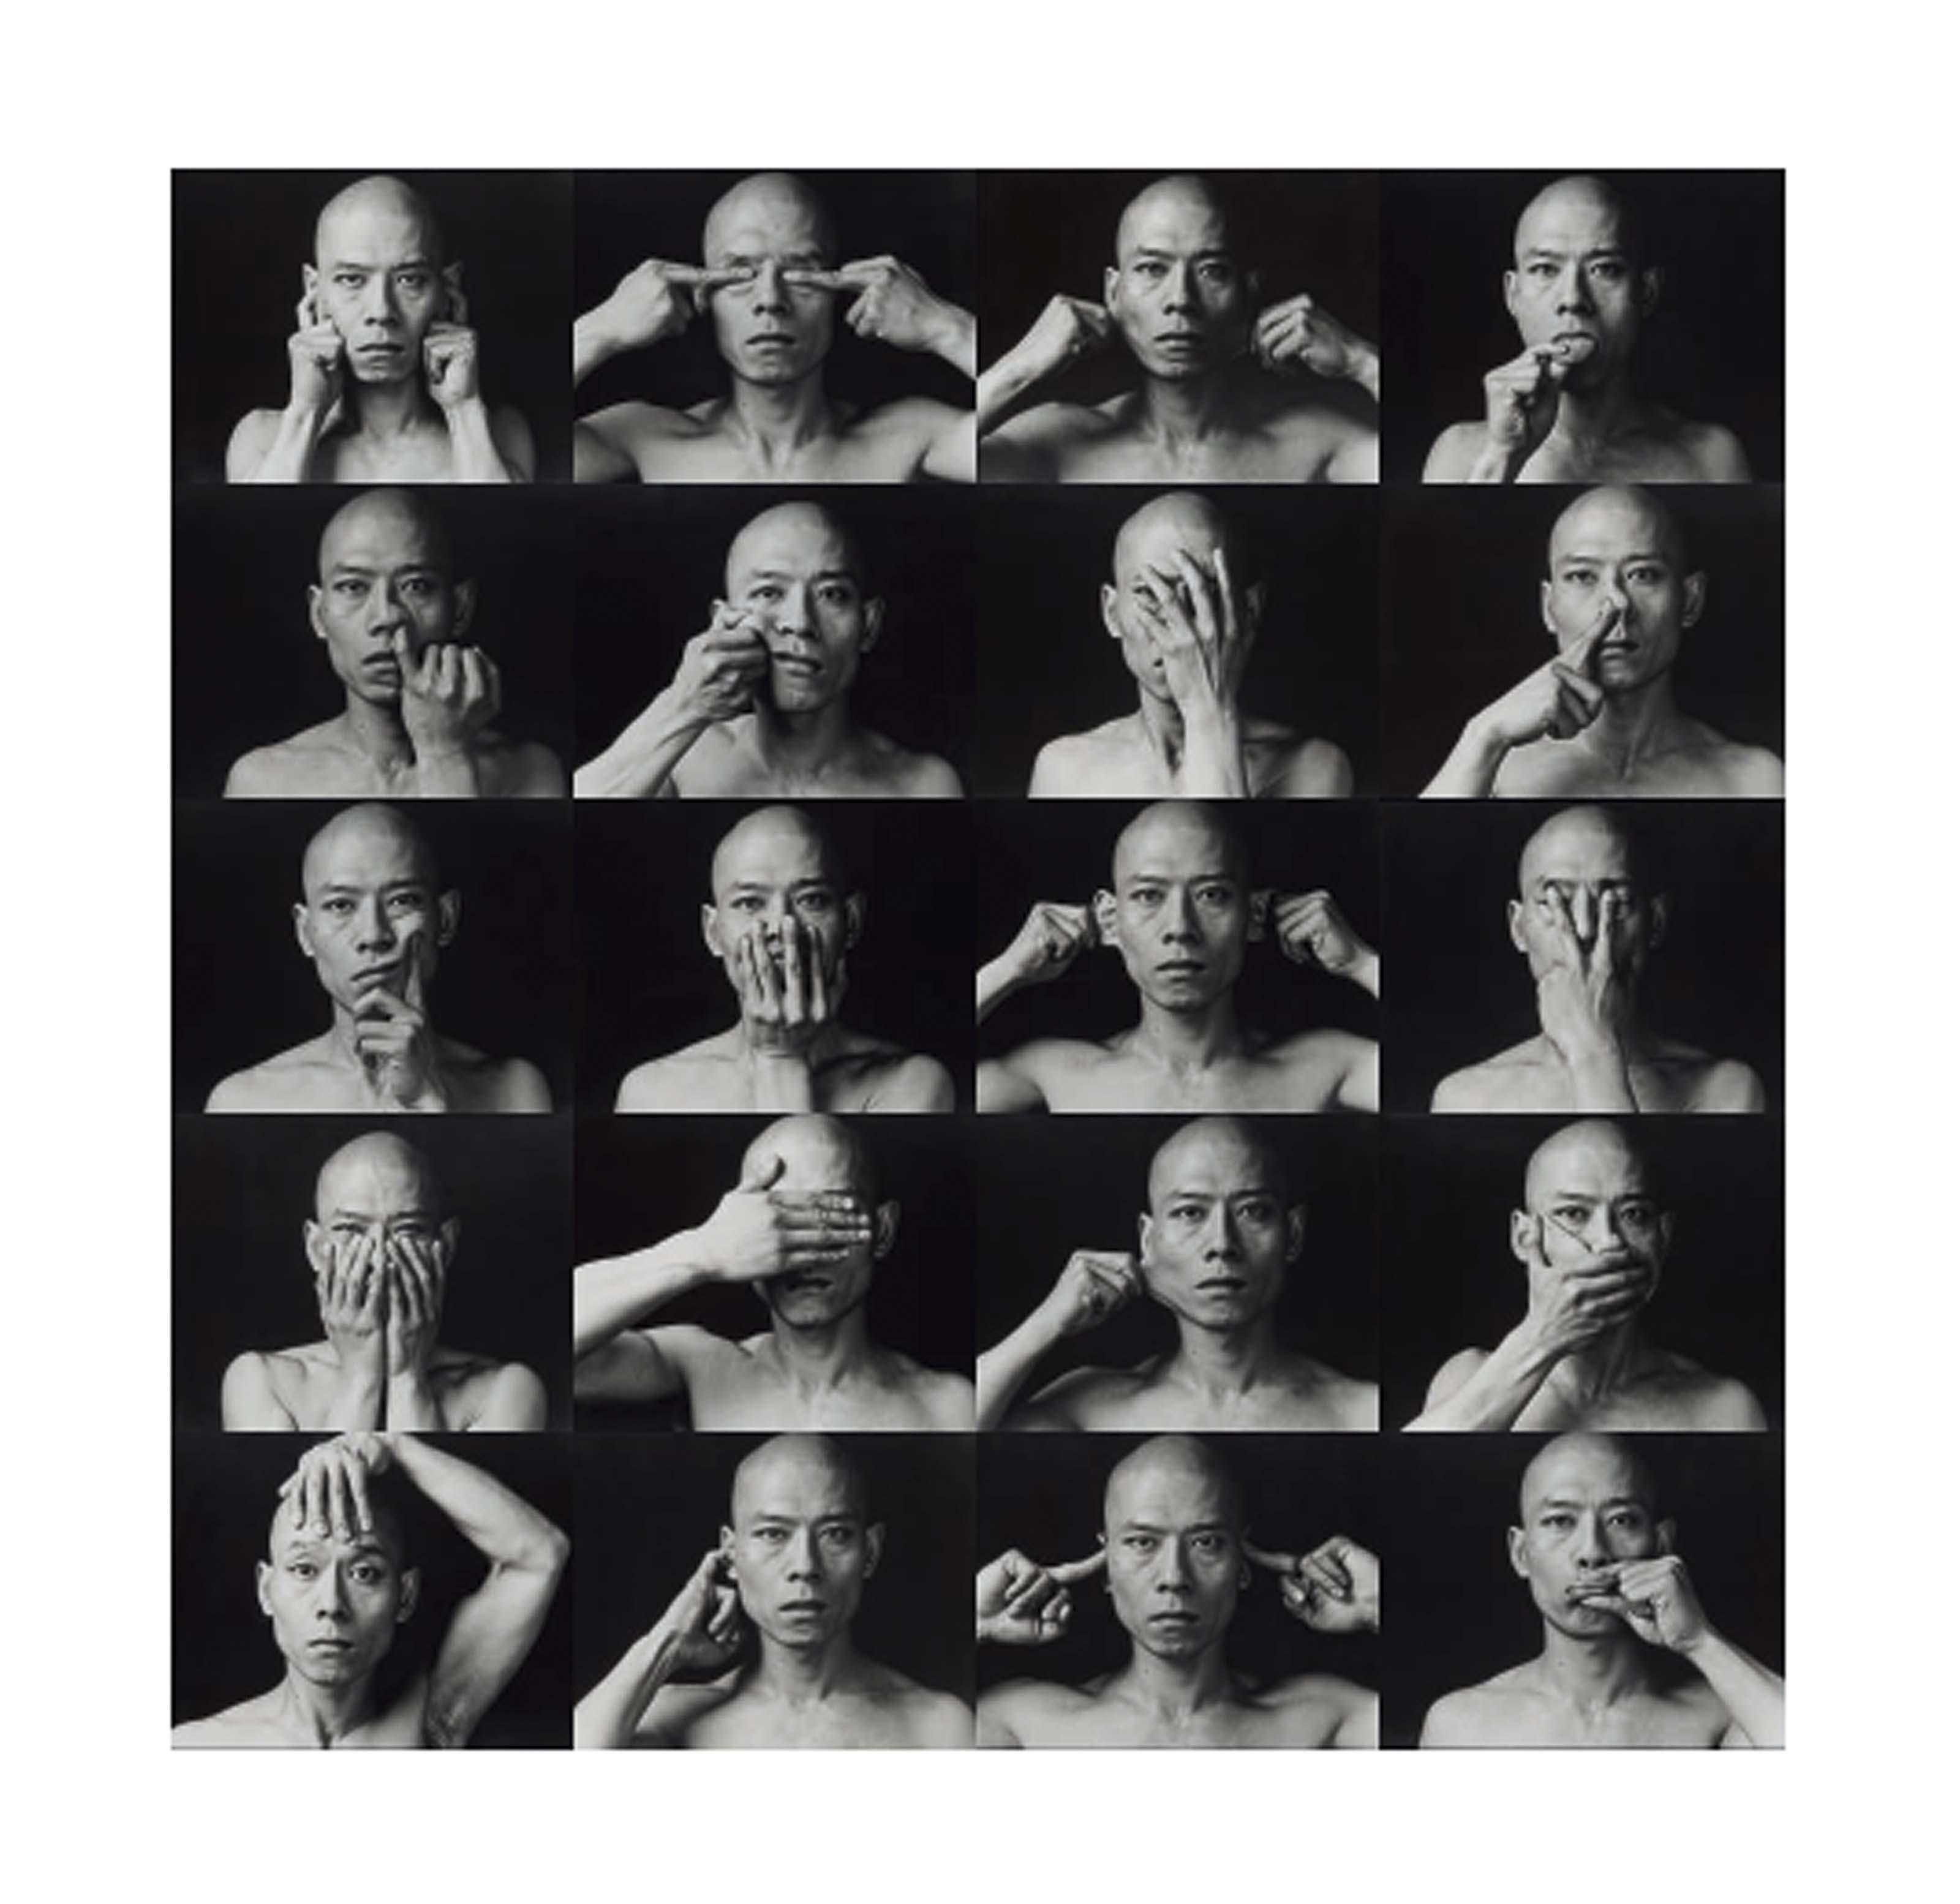 Skin (20 autoportraits), 1997